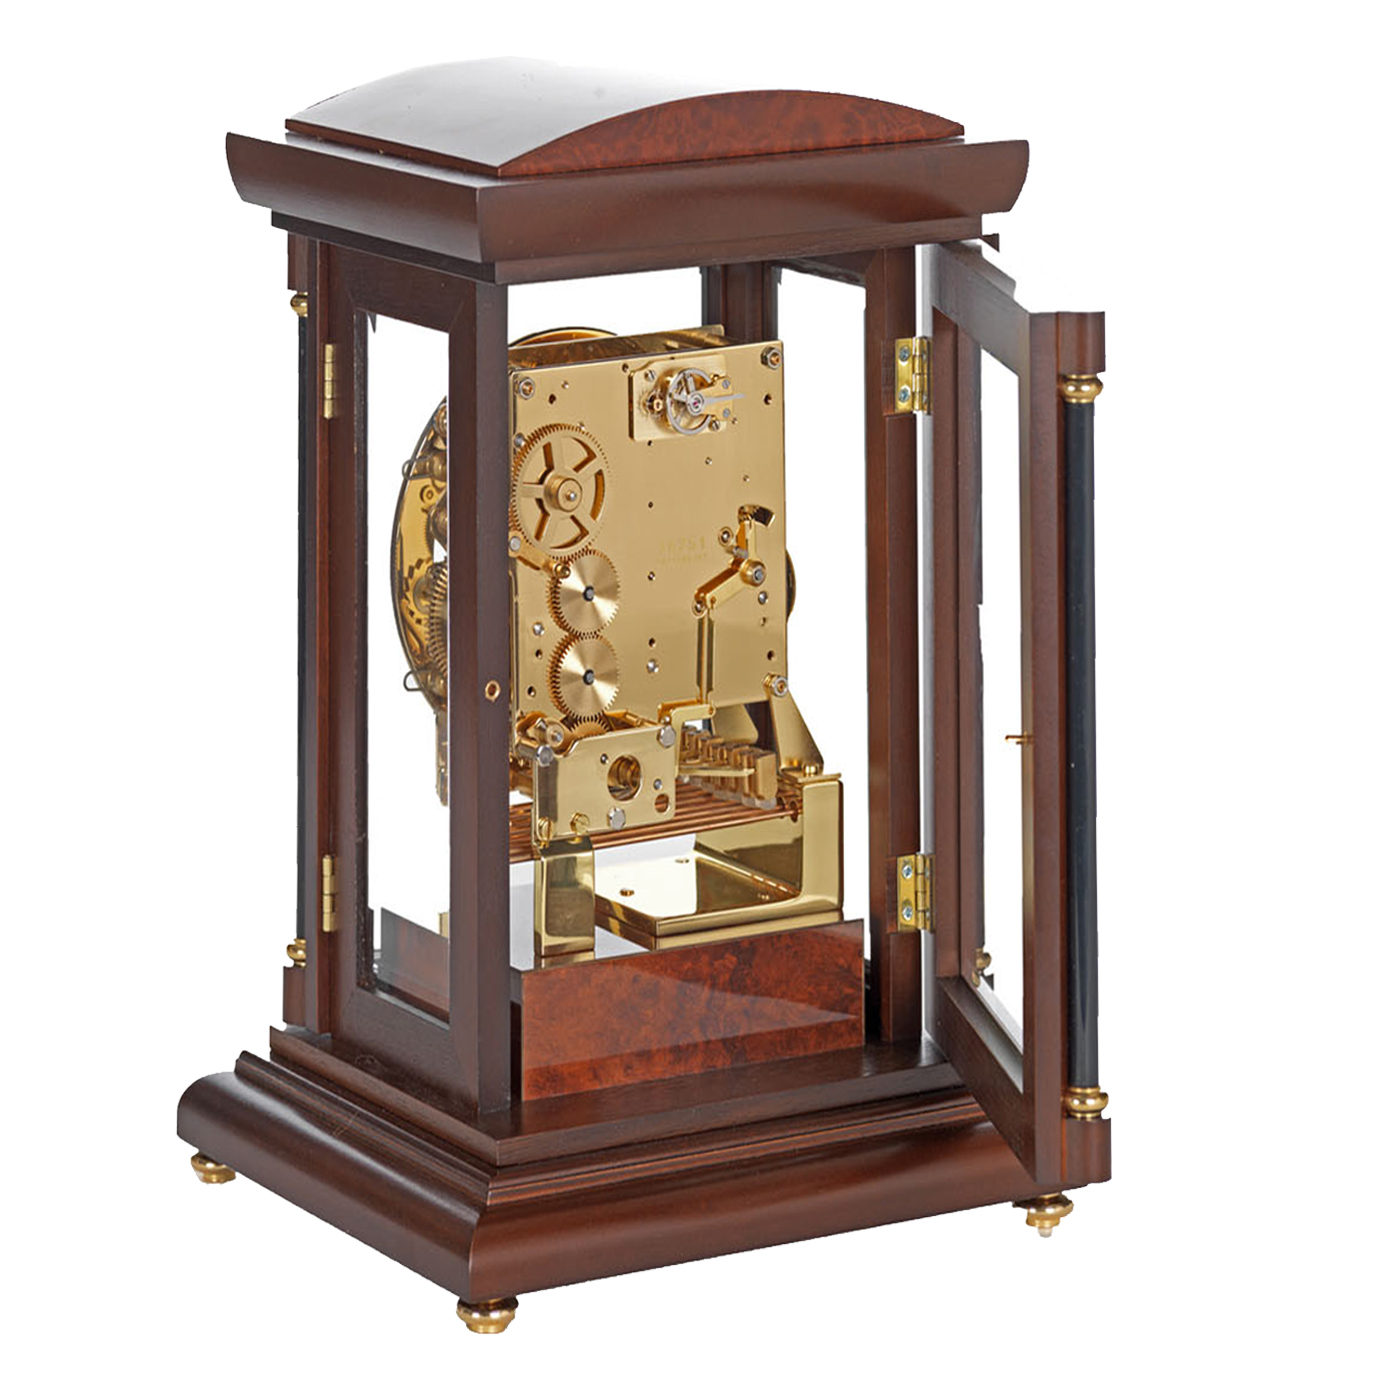 bradley-triple-chime-mechanical-mantel-clock-walnut-rear